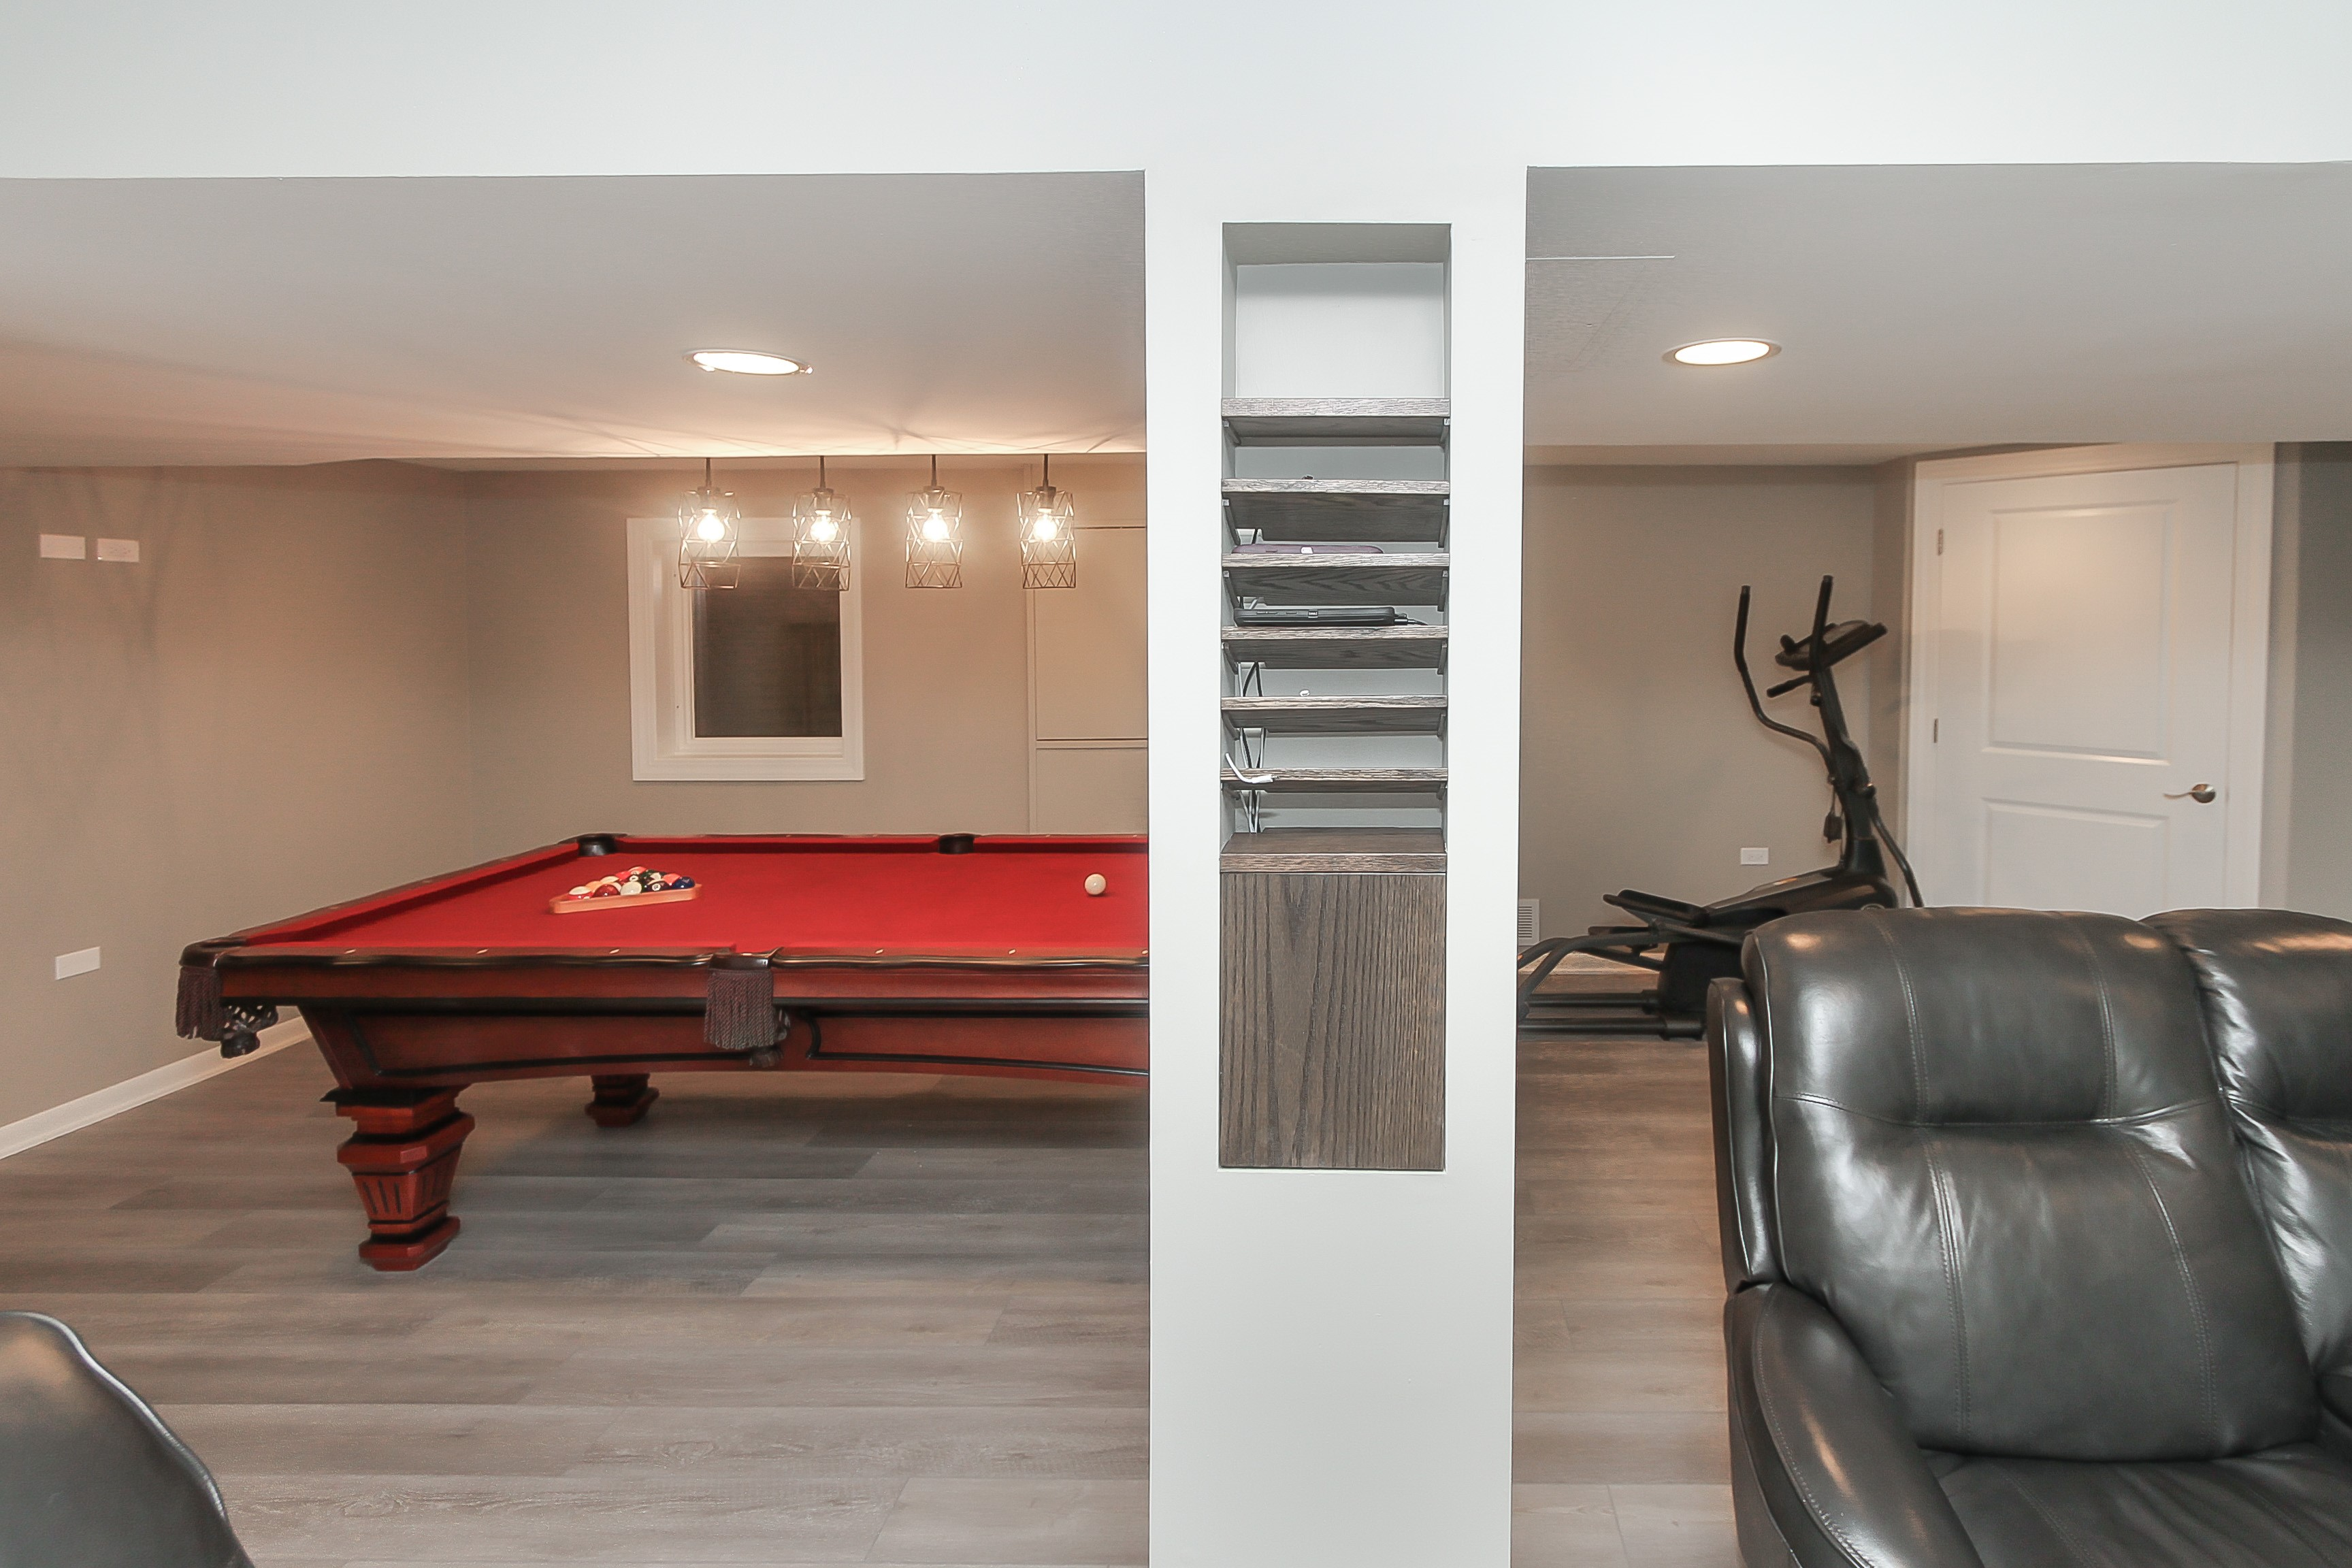 Basement-Renovation-with-Pool-Table-Arlington-Heights-IL